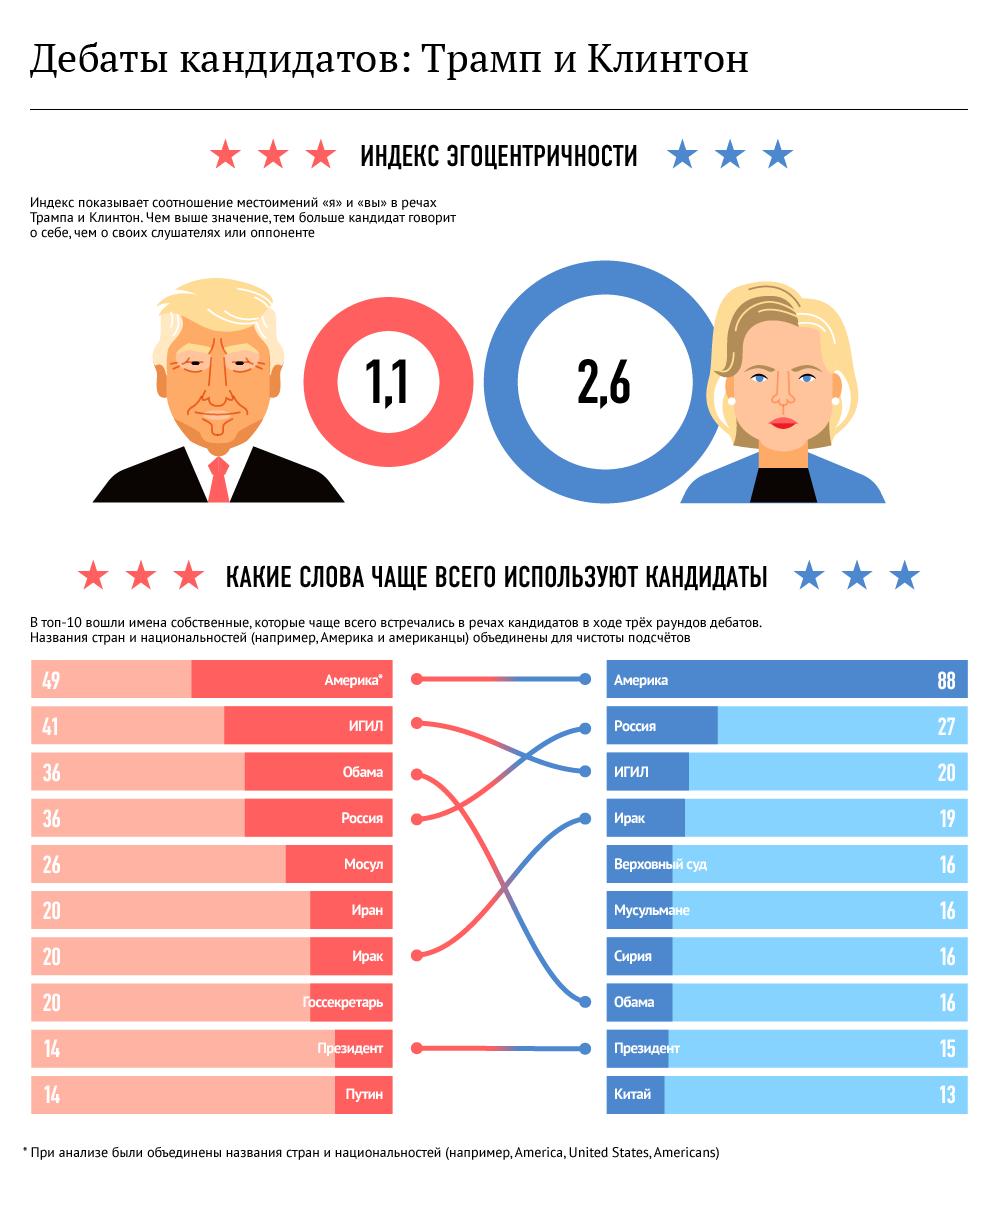 Дебаты кандидатов: Трамп и Клинтон